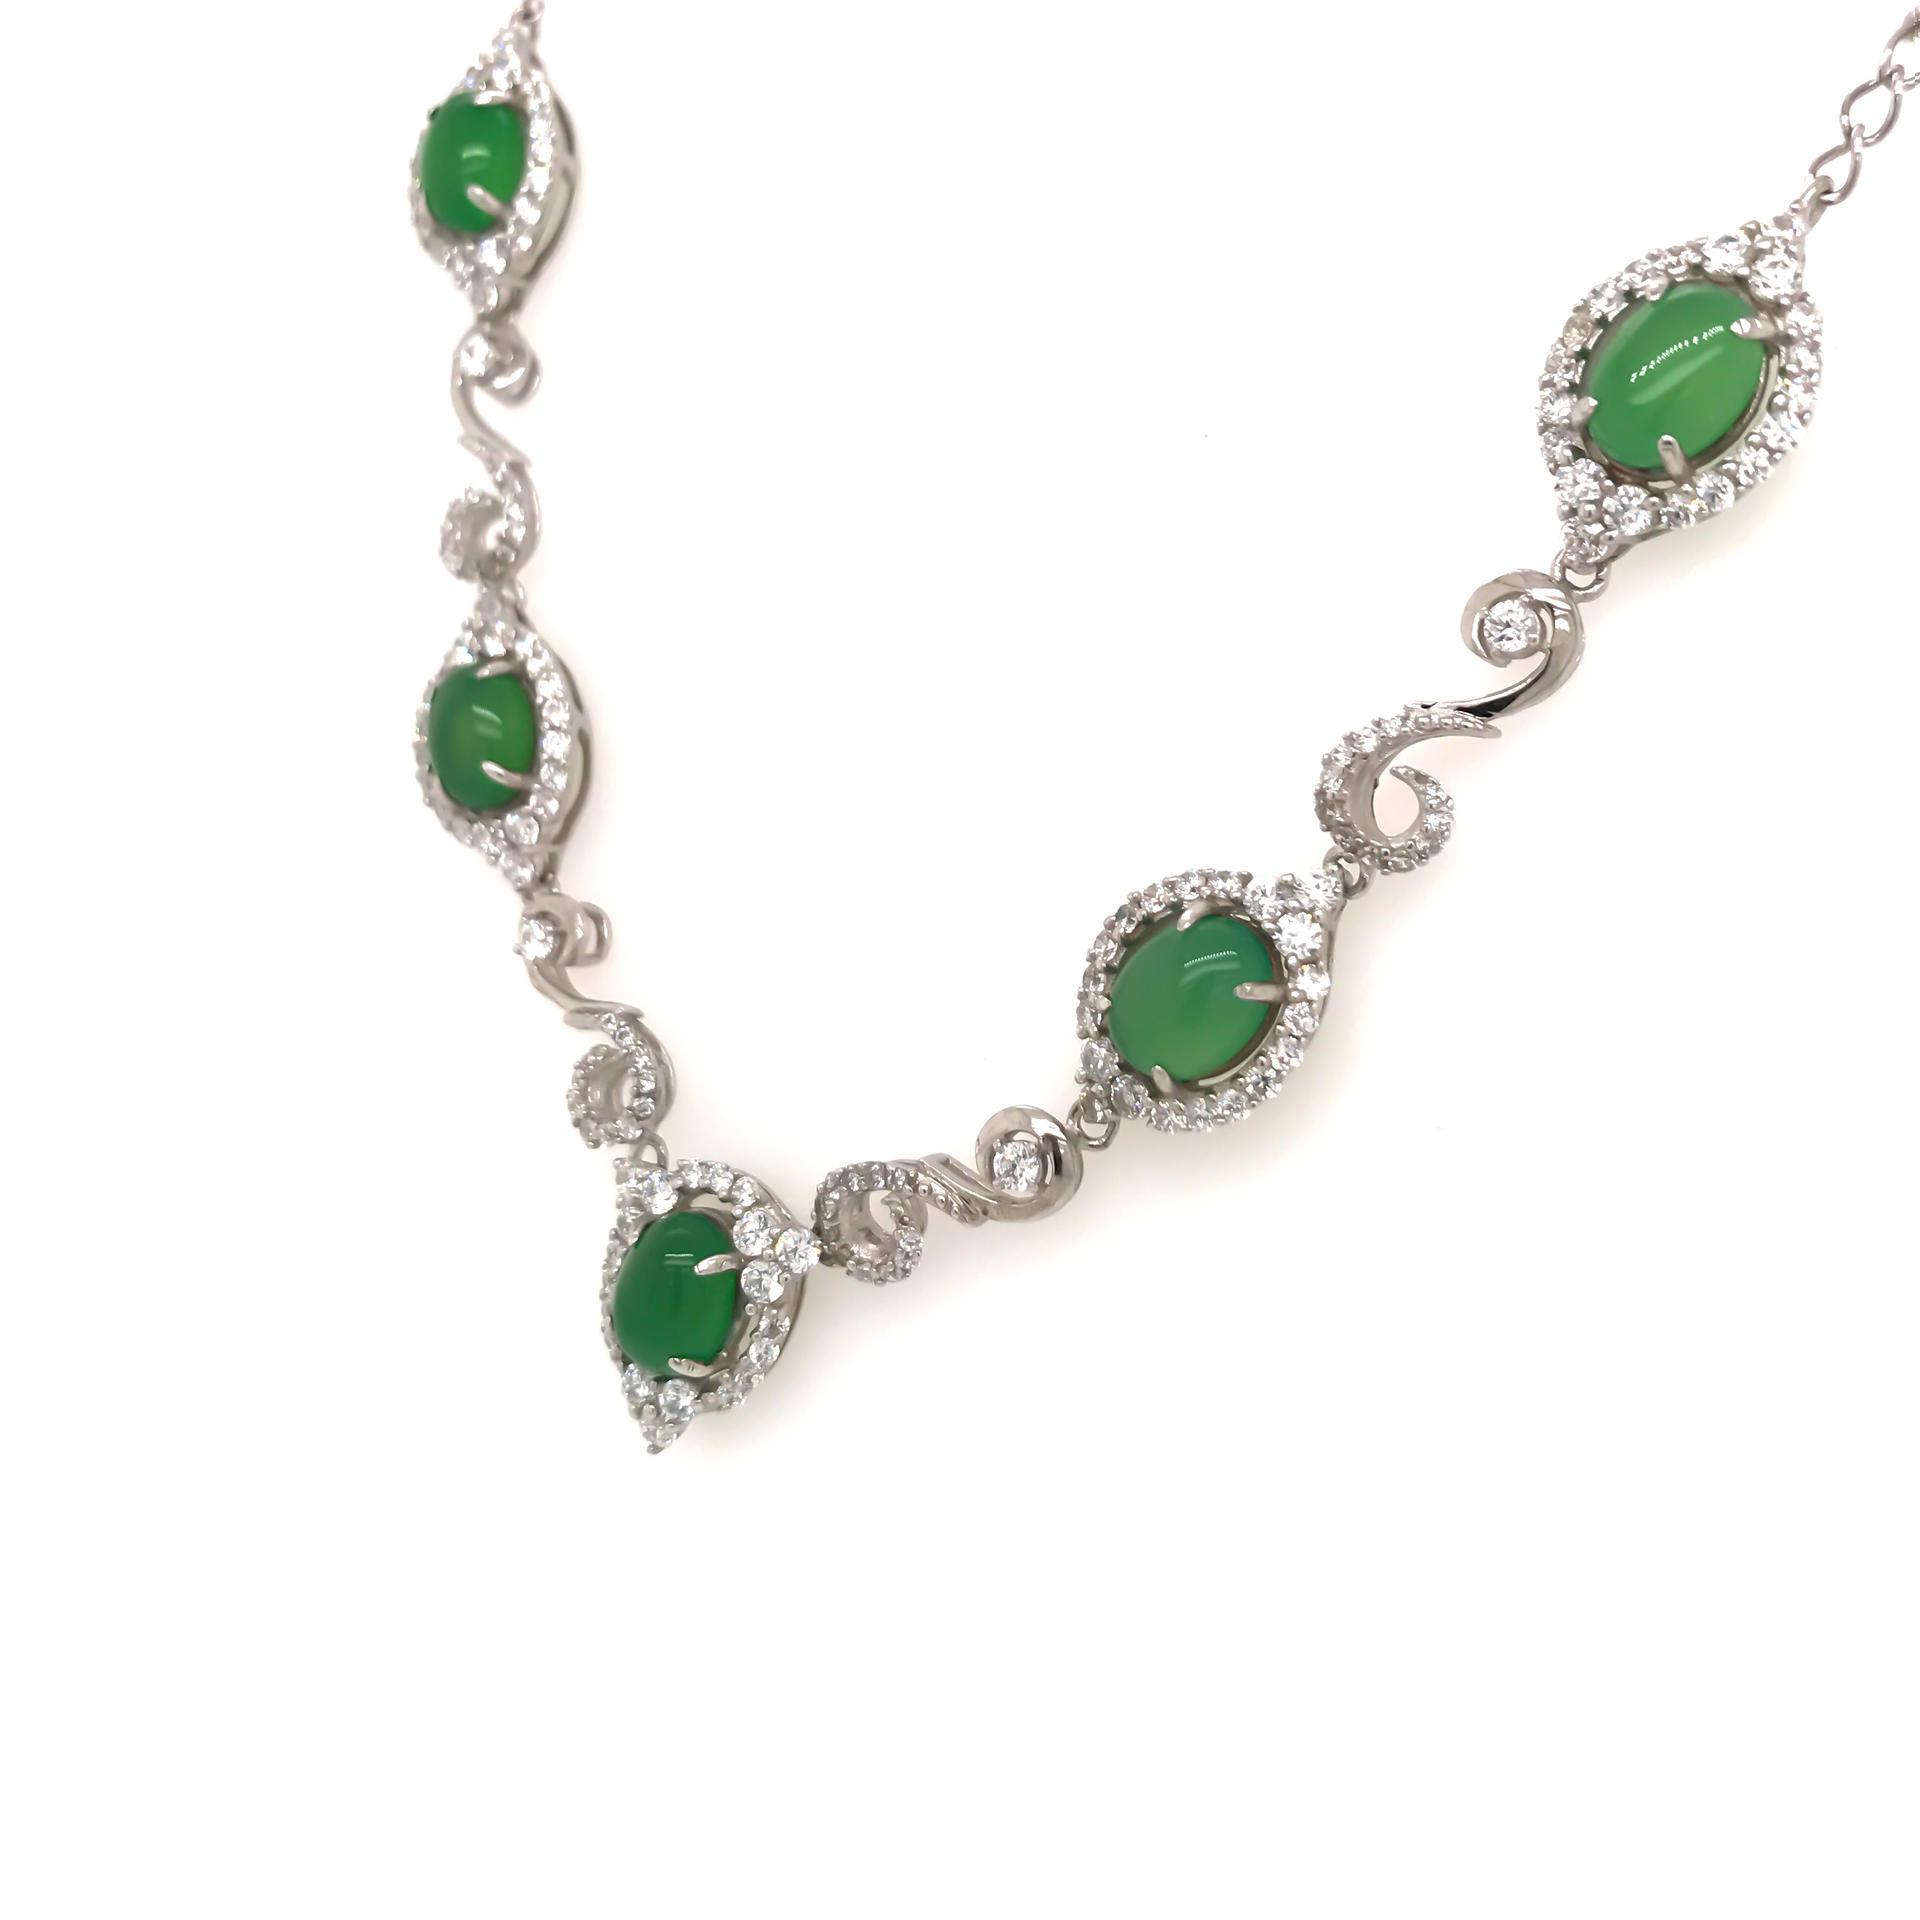 Delicate Silver Chain Emerald Stone Statement Necklace For Women